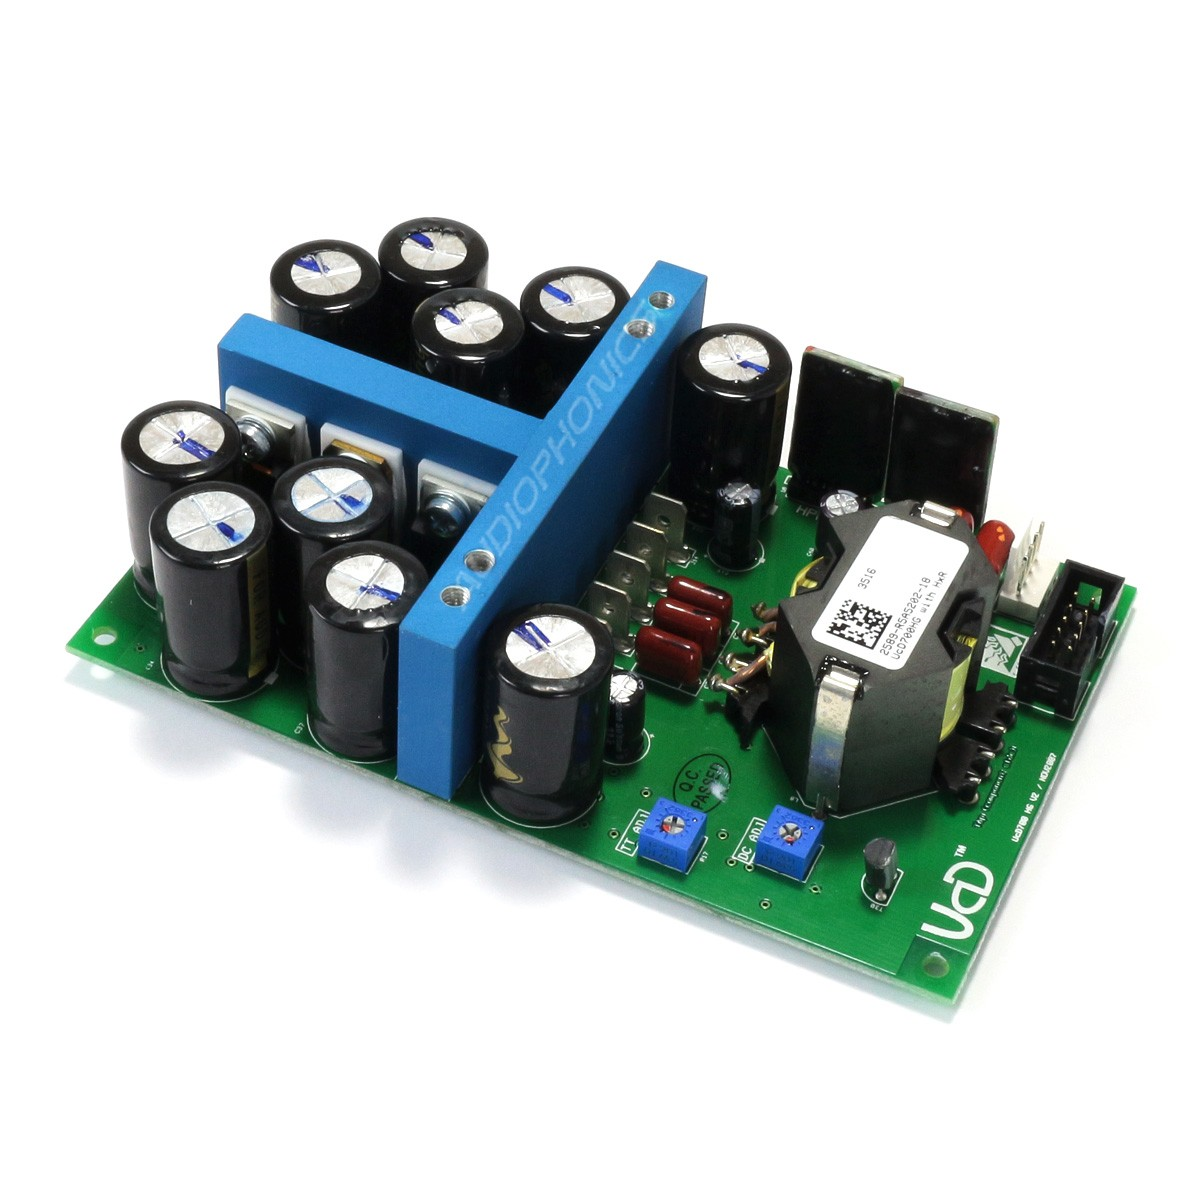 HYPEX UCD700HG HxR Class D Power Amplifier Module 700W 4 Ohm